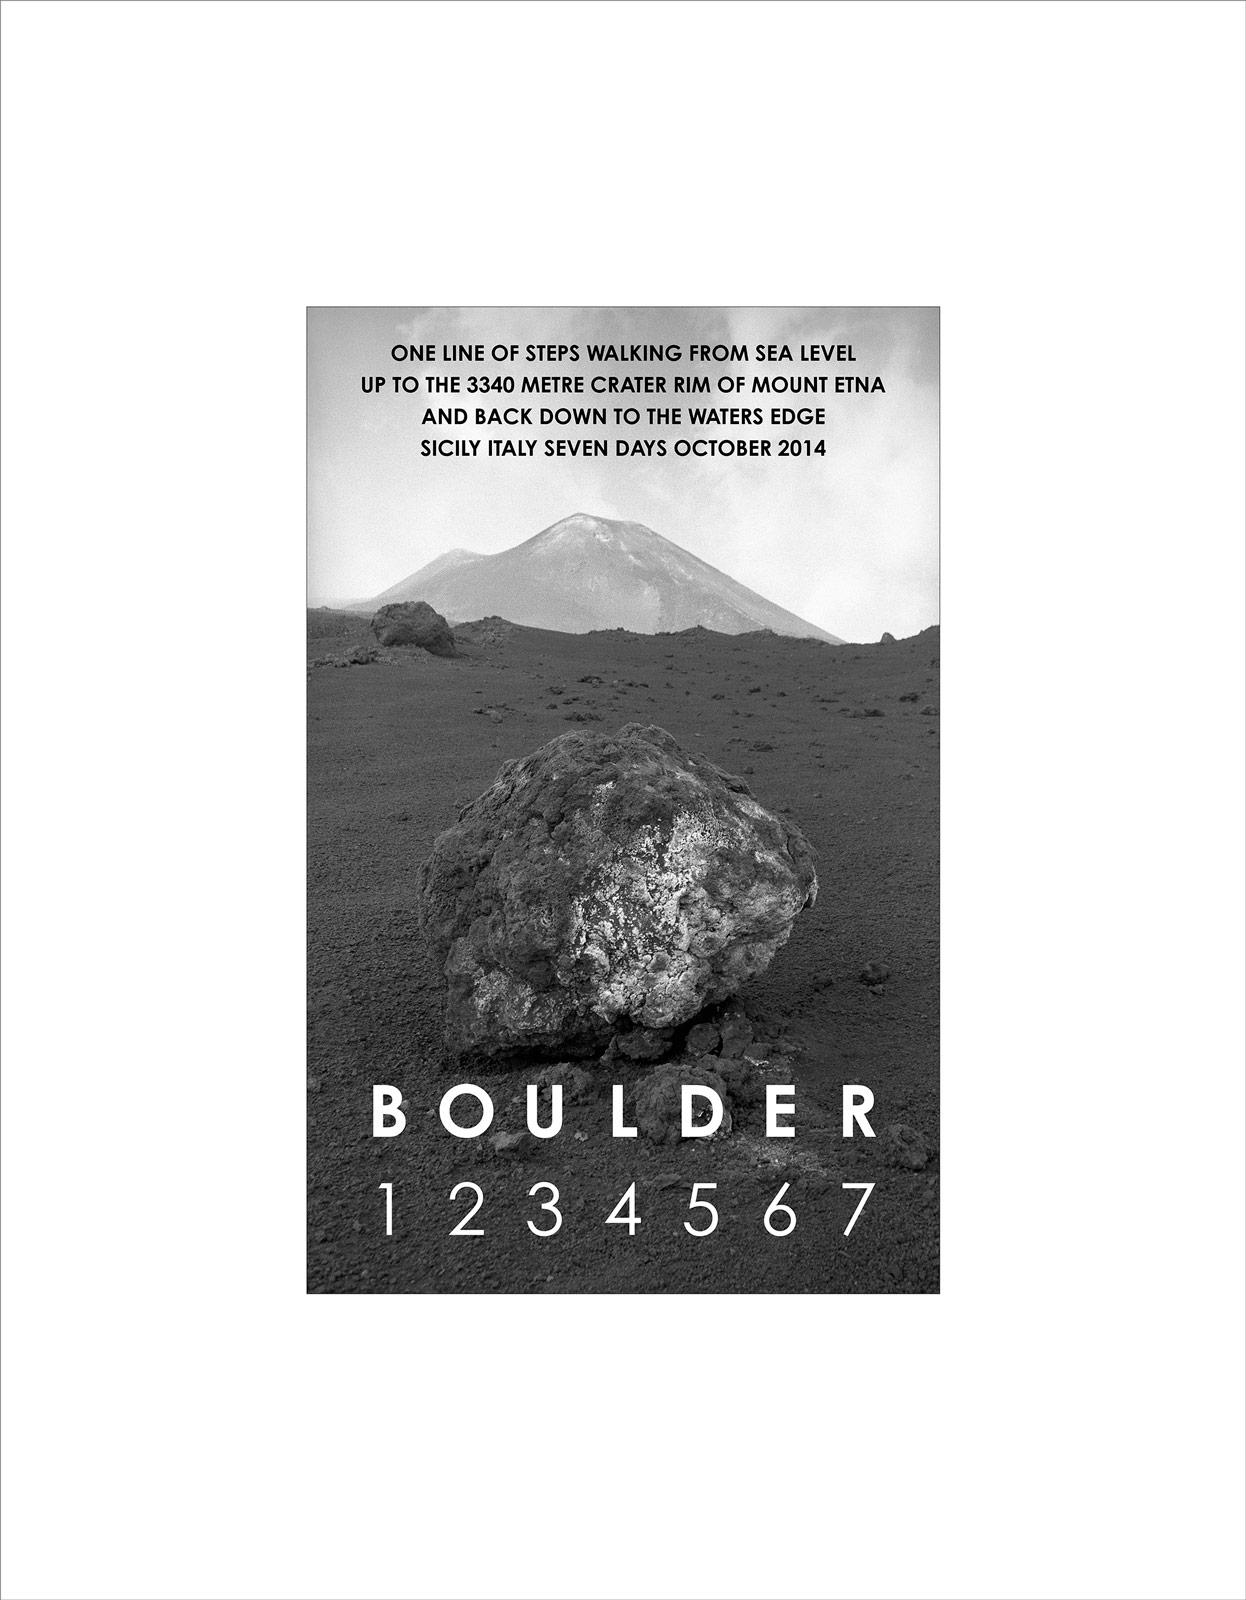 Boulder Etna Sicily 2014, giclée print, 60 x 47 cm, ed 50